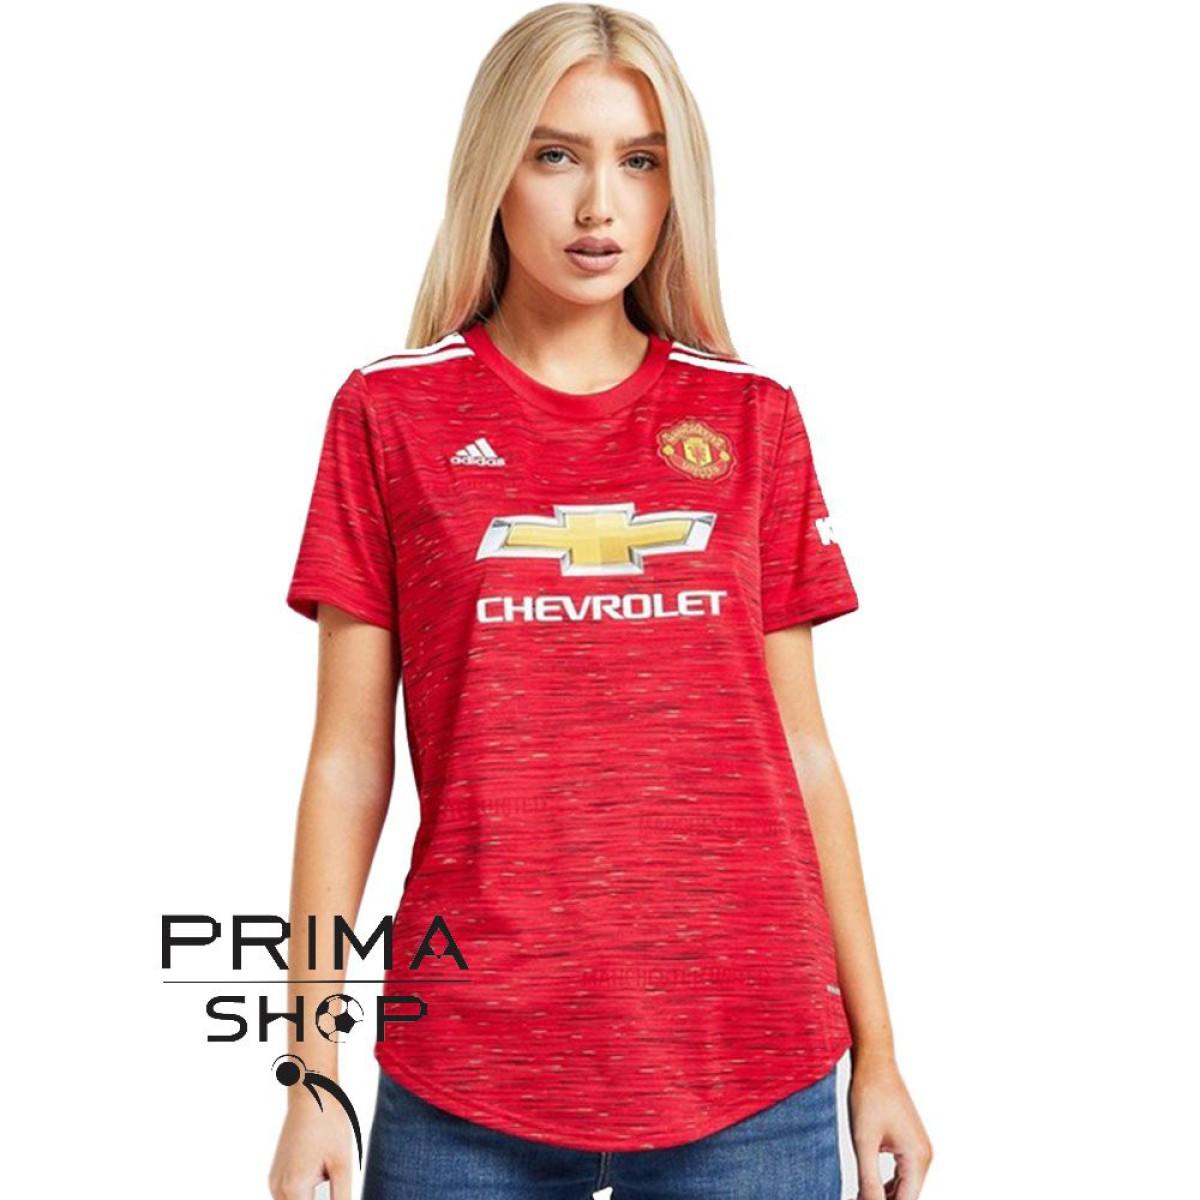 لباس زنانه منچستر یونایتد 2021